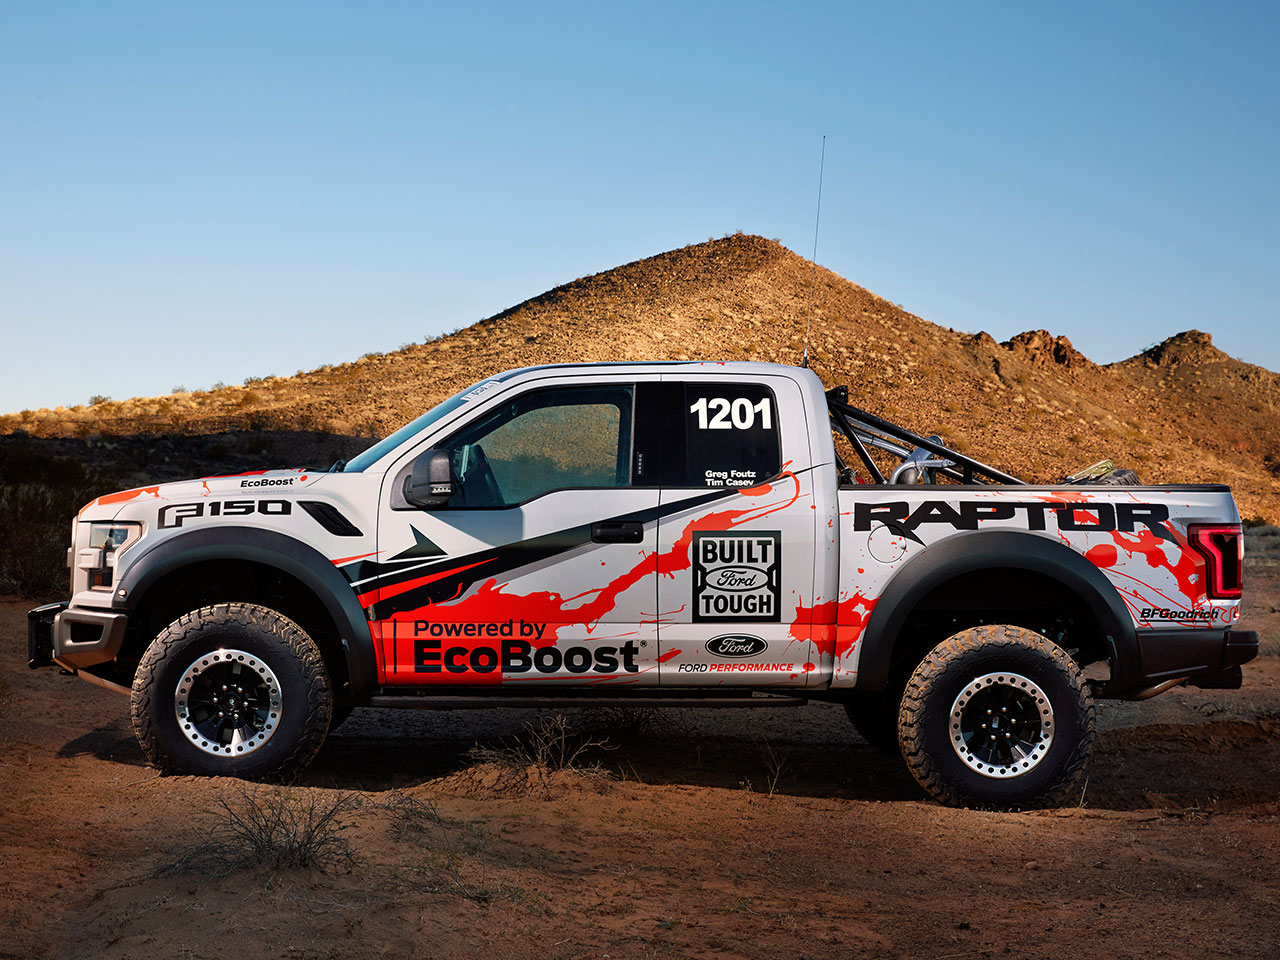 Ford F 150 Raptor 2016 Preis Update Autozeitung De